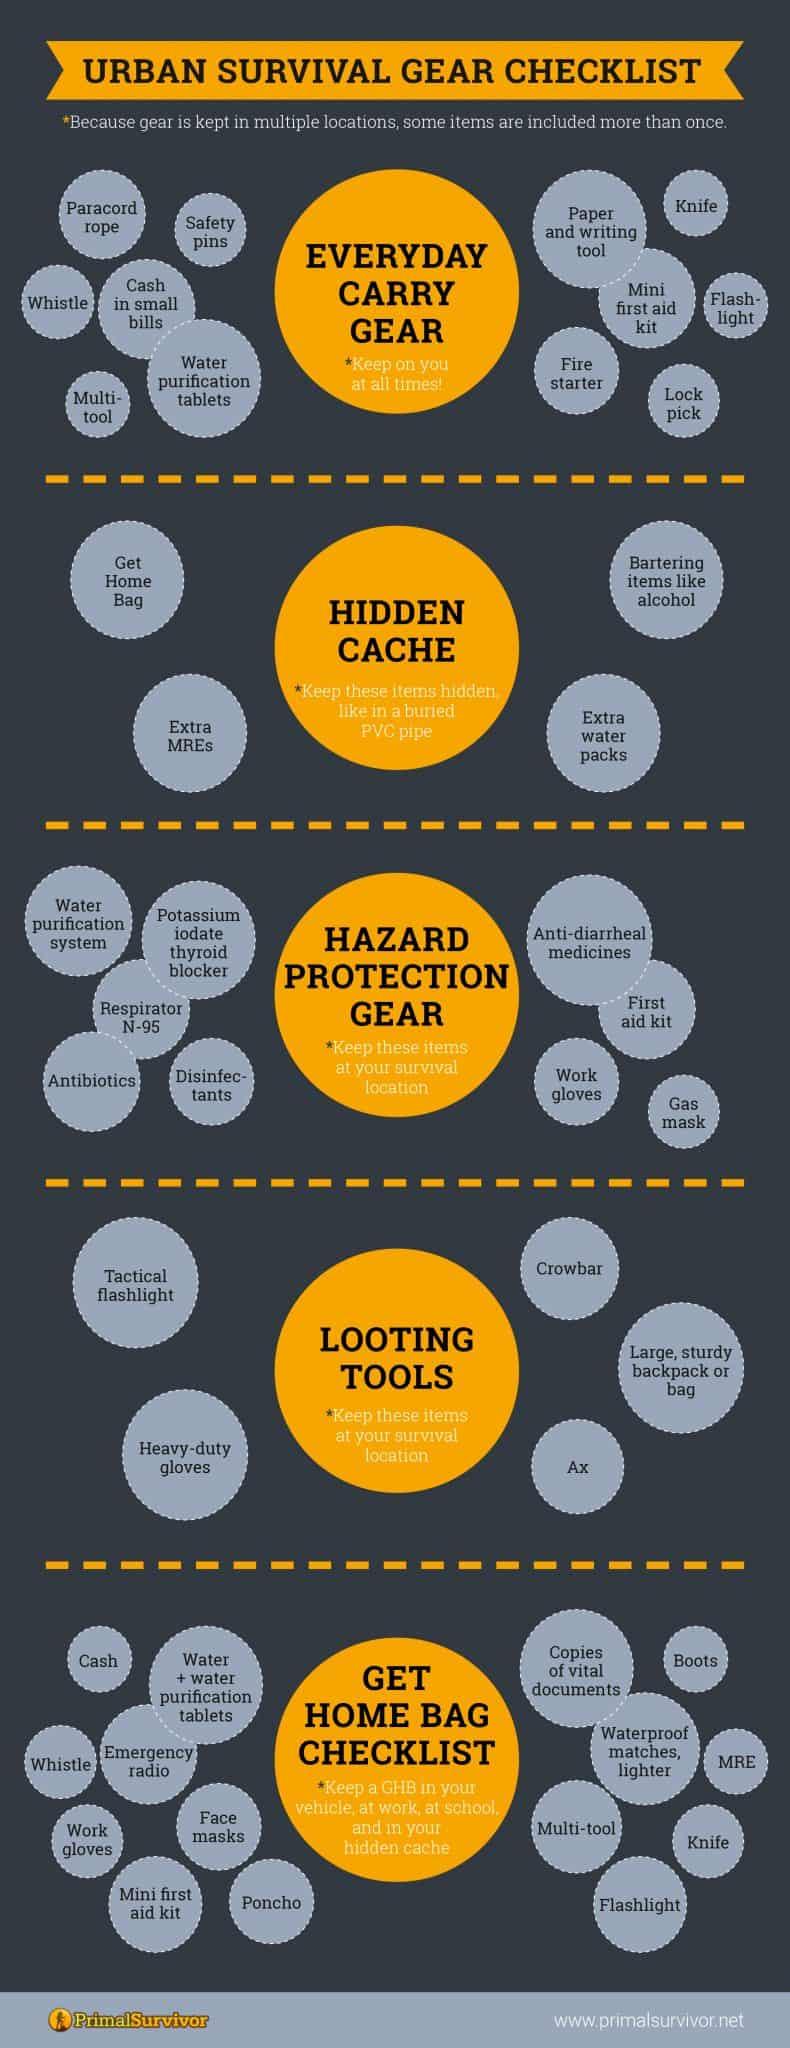 The Ultimate Urban Survival Gear Checklist